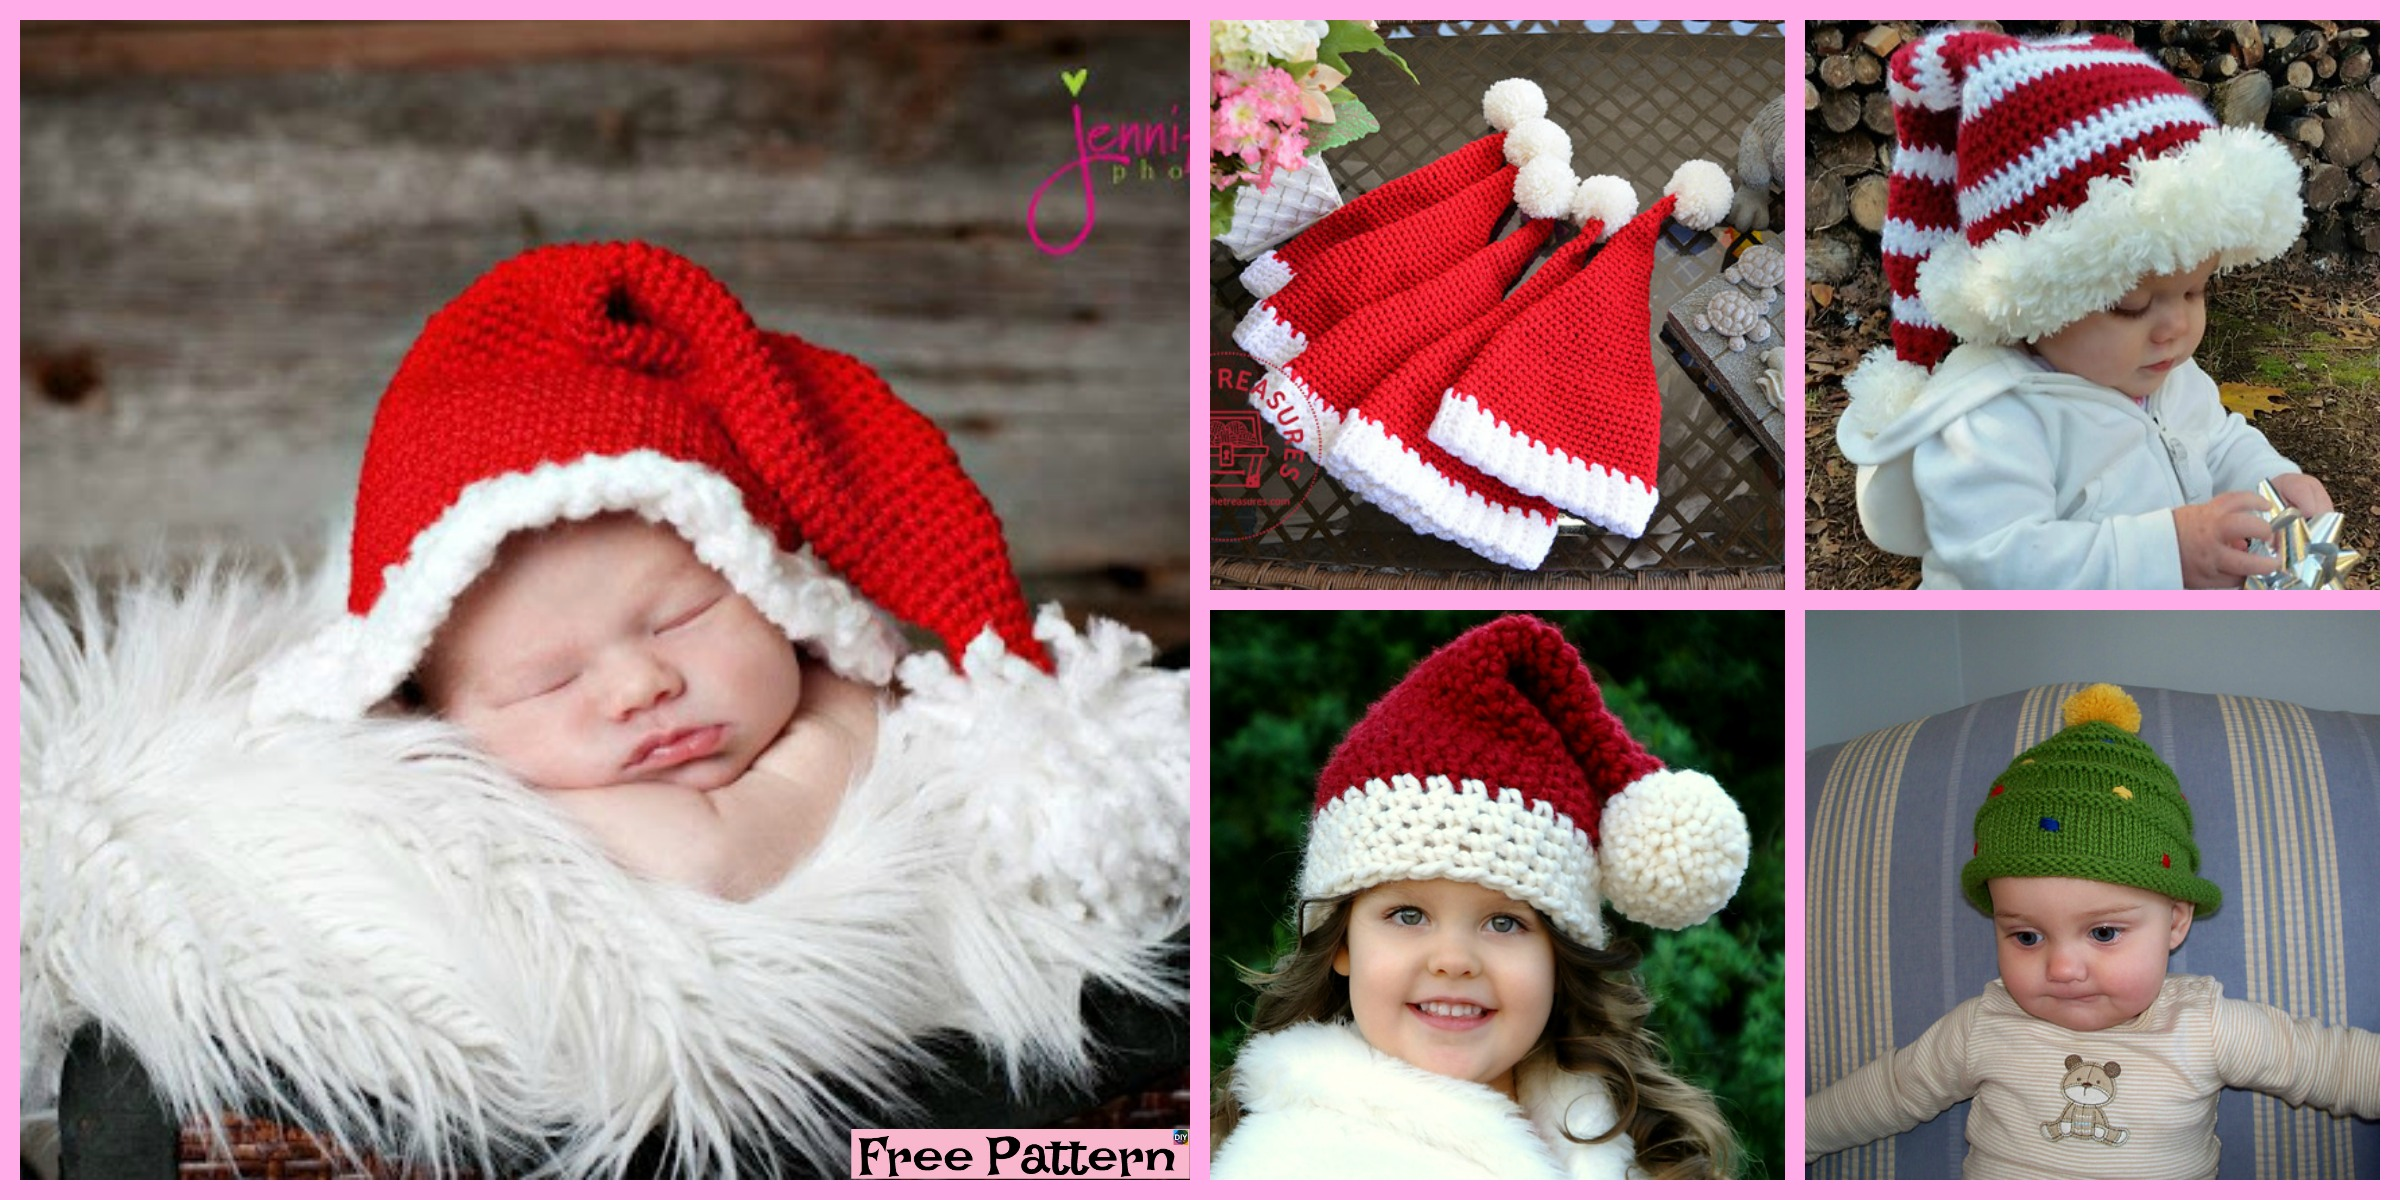 10 Crochet Christmas Hats – Free Patterns